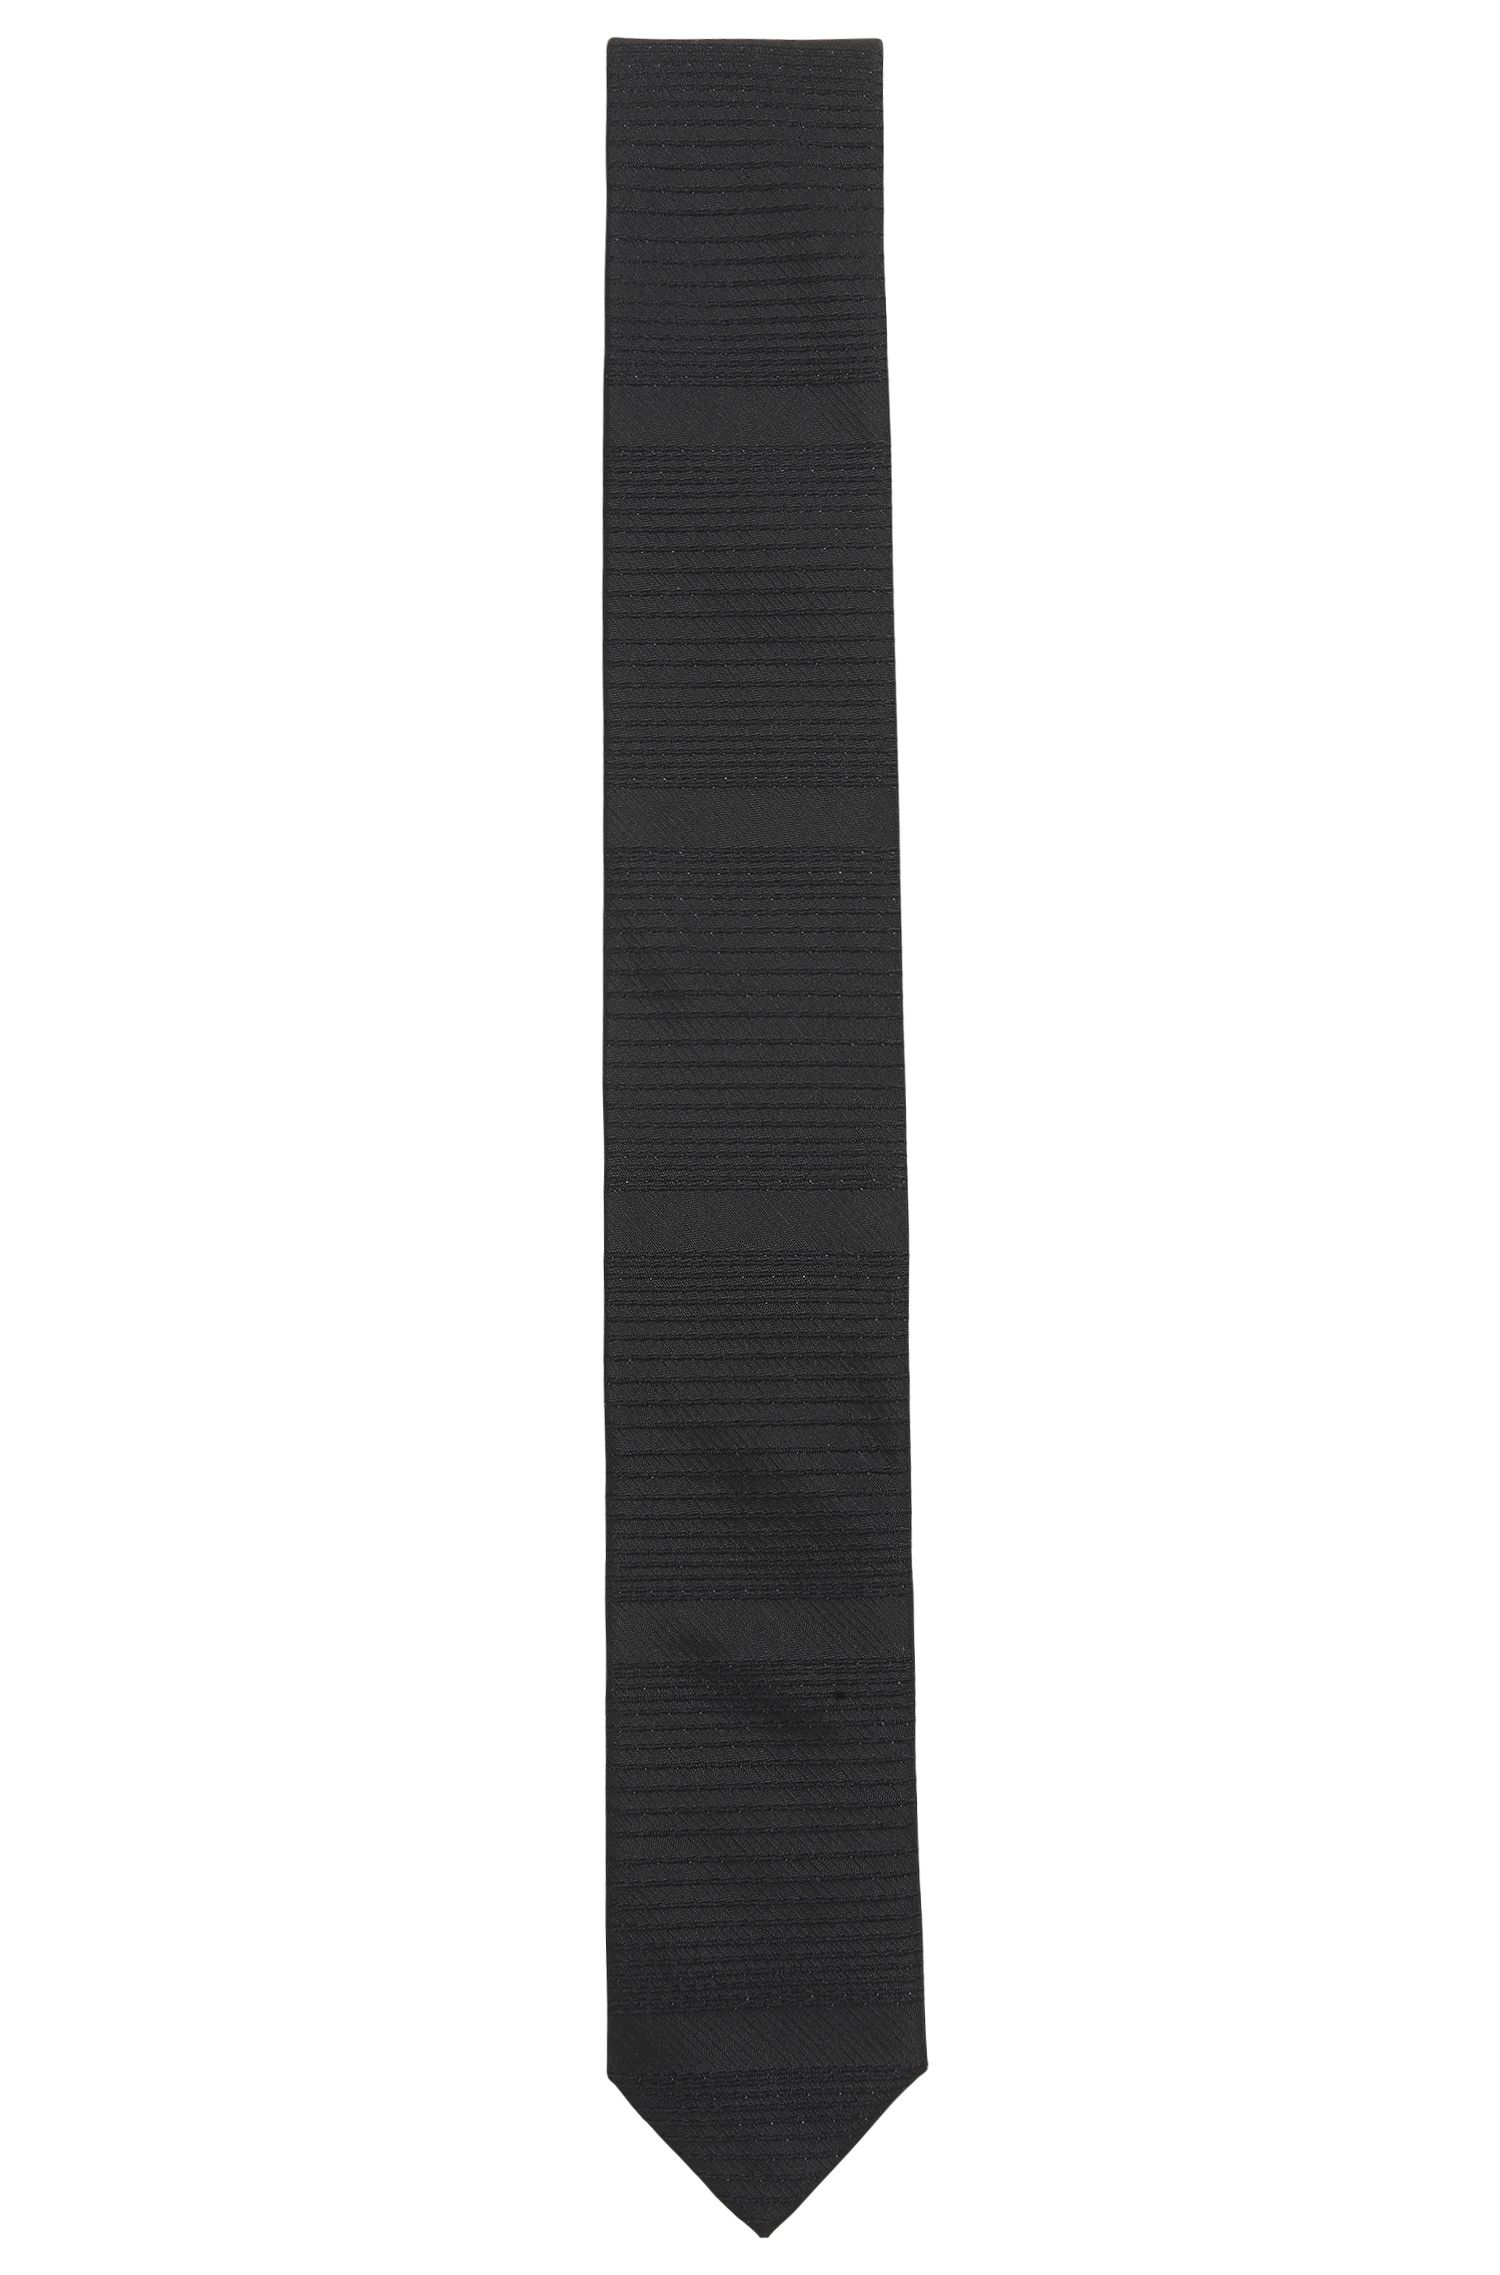 Horizontal-striped tie in a silk blend